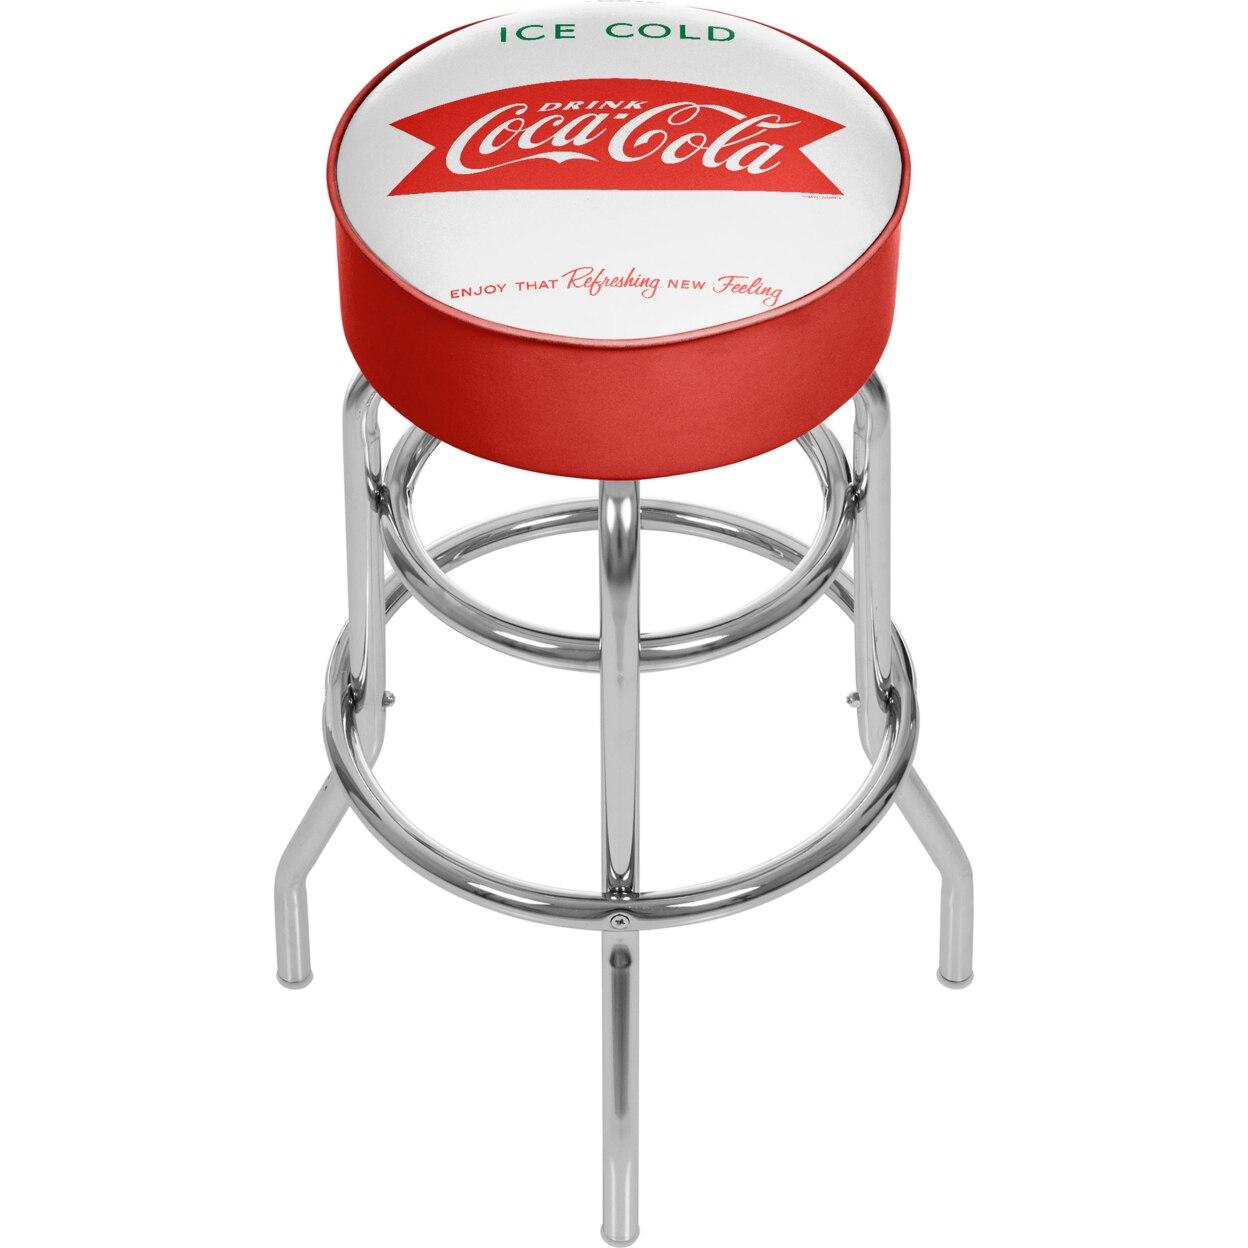 Vintage Coca-Cola Coke Ice Cold Design Padded Swivel Bar Stool 30 Inches High cold drinks coke dispenser vending selling machine field modulation coke making machine